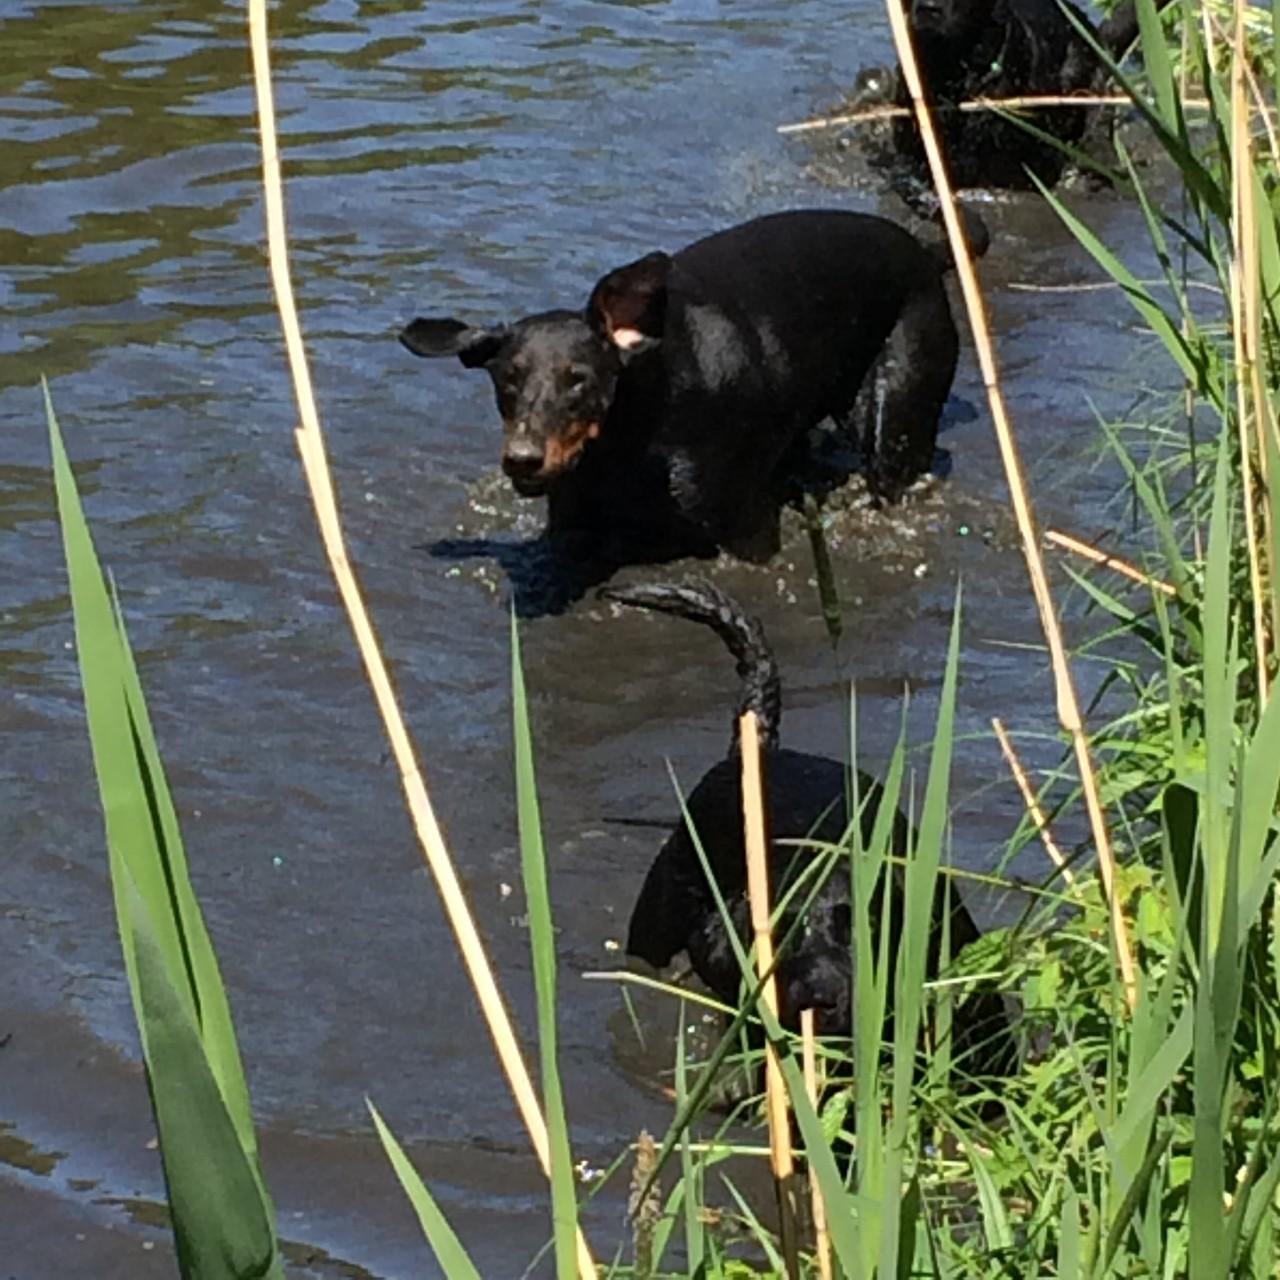 Hundeschule, Hundetraining Hamburg, Gassiservice Hamburg, Hundebetreuung Hamburg, Hundeschule Hamburg